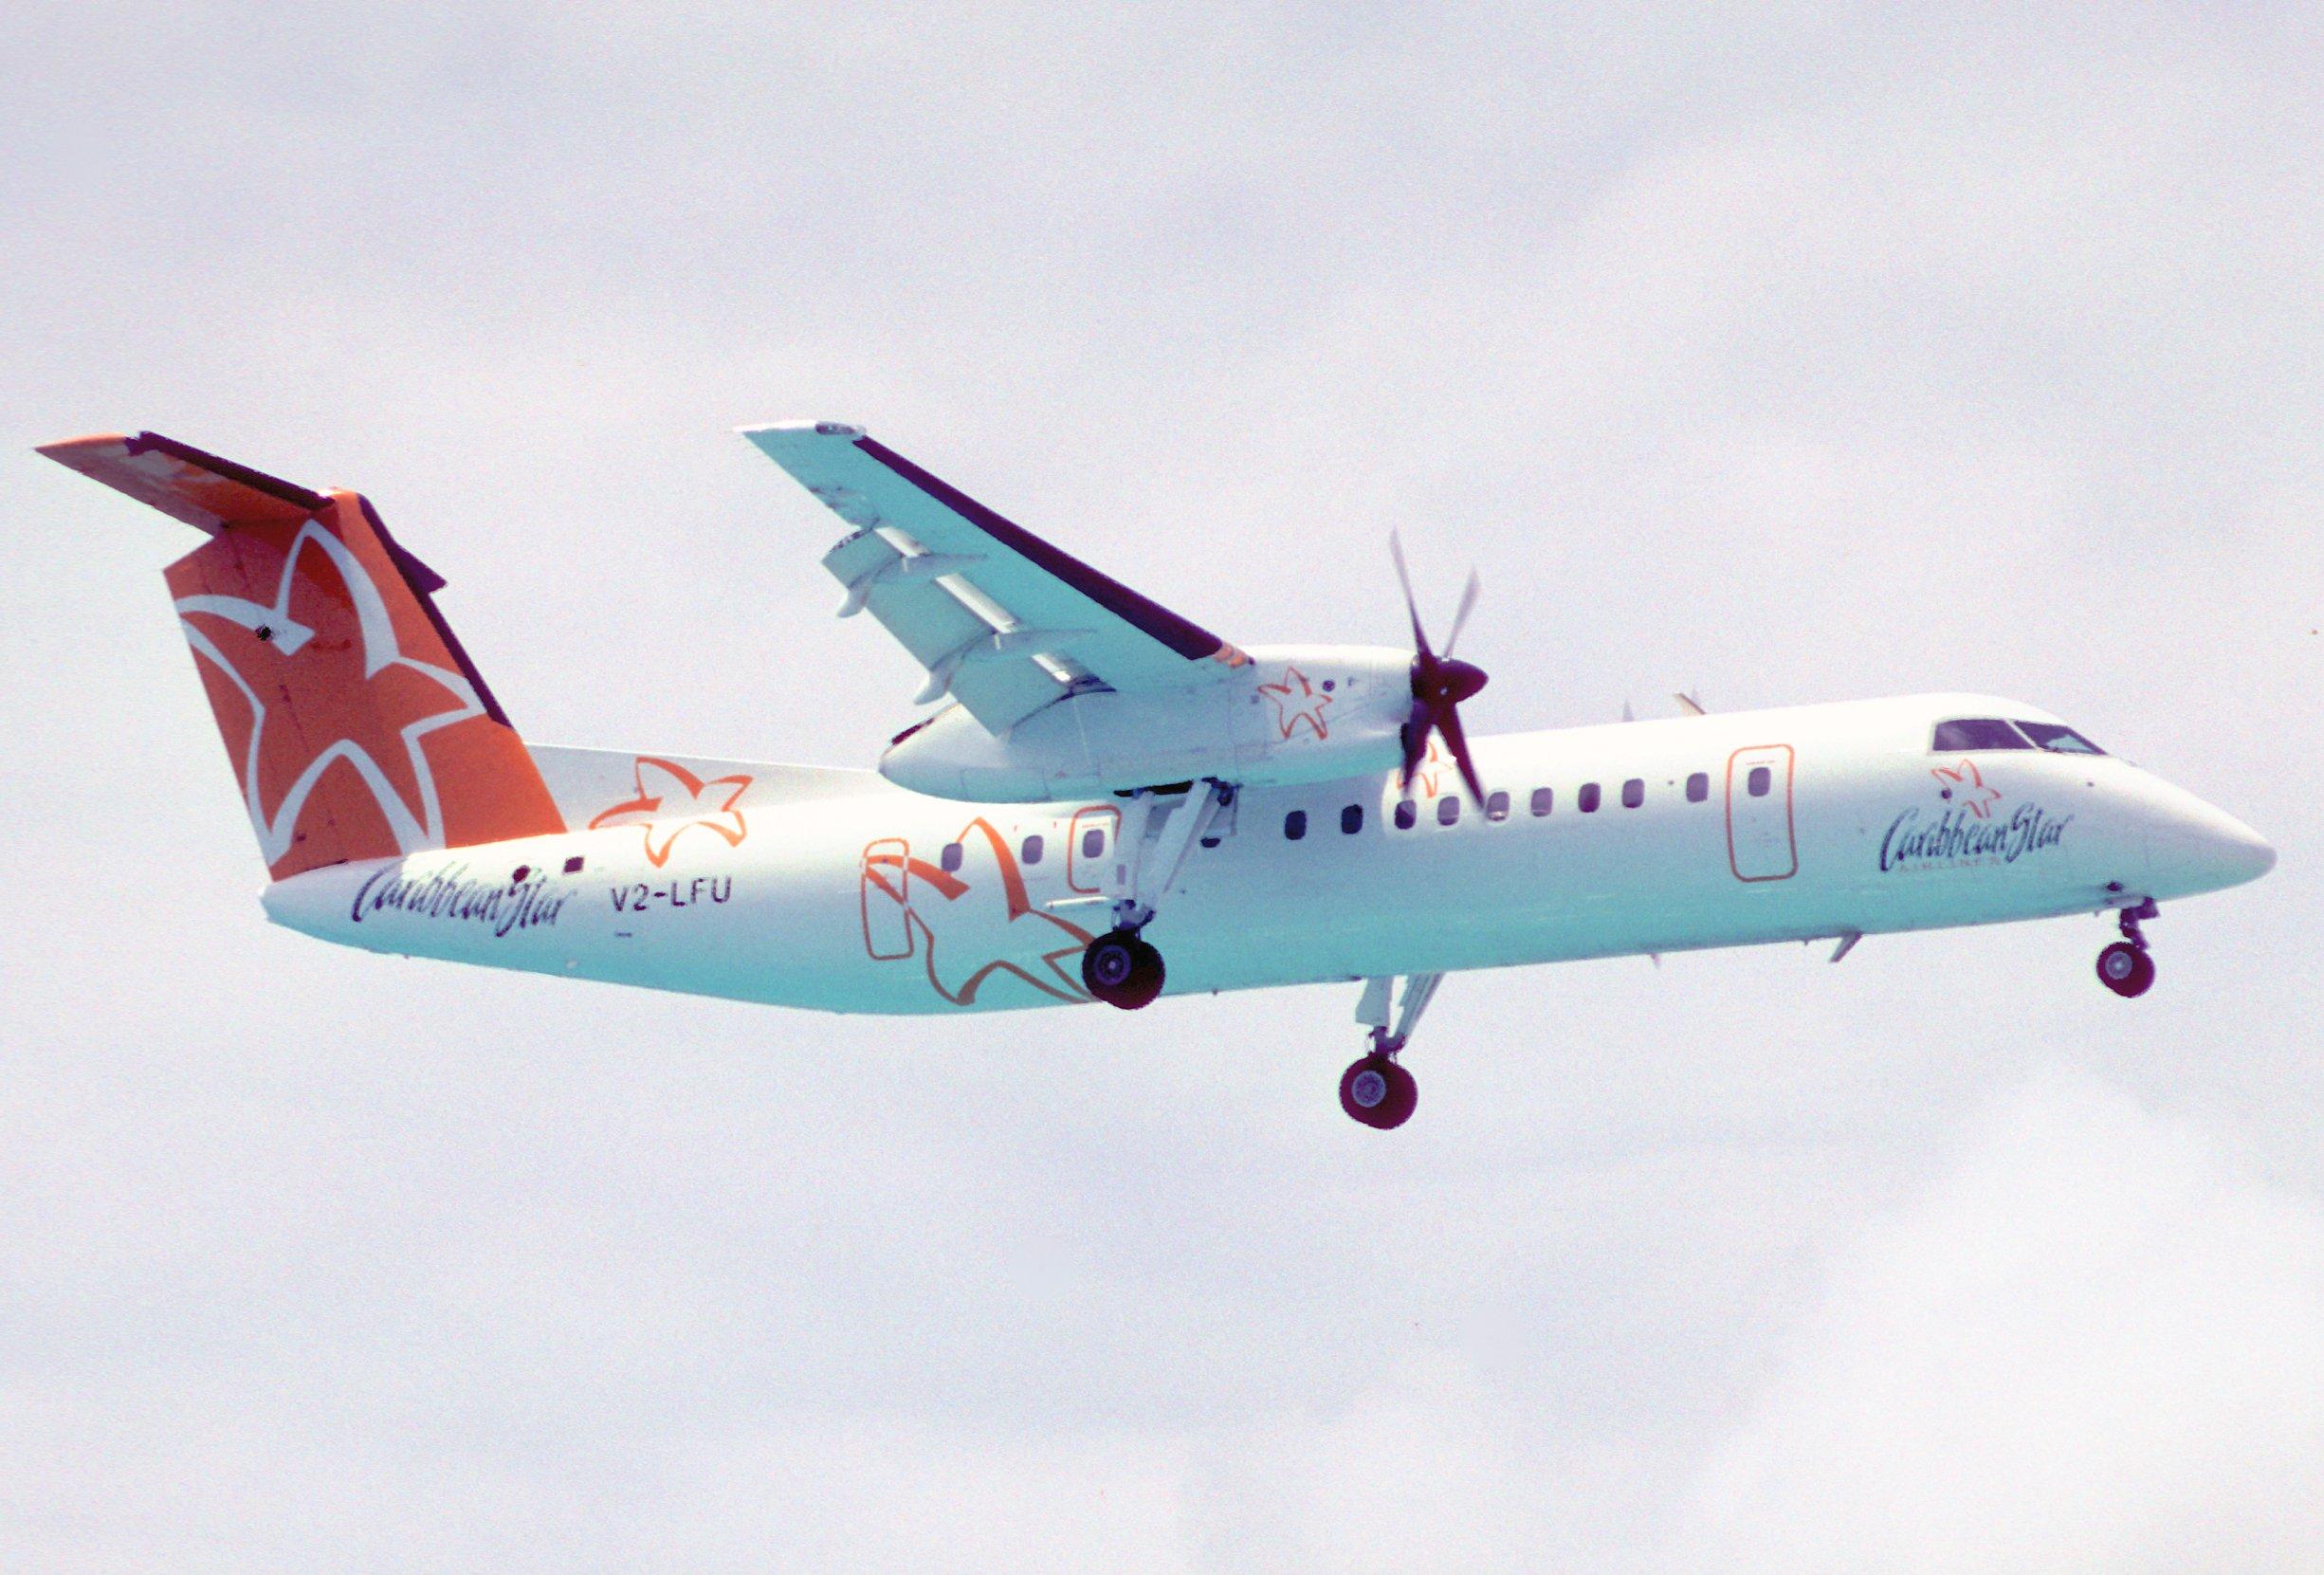 Caribbean Star Airline 93